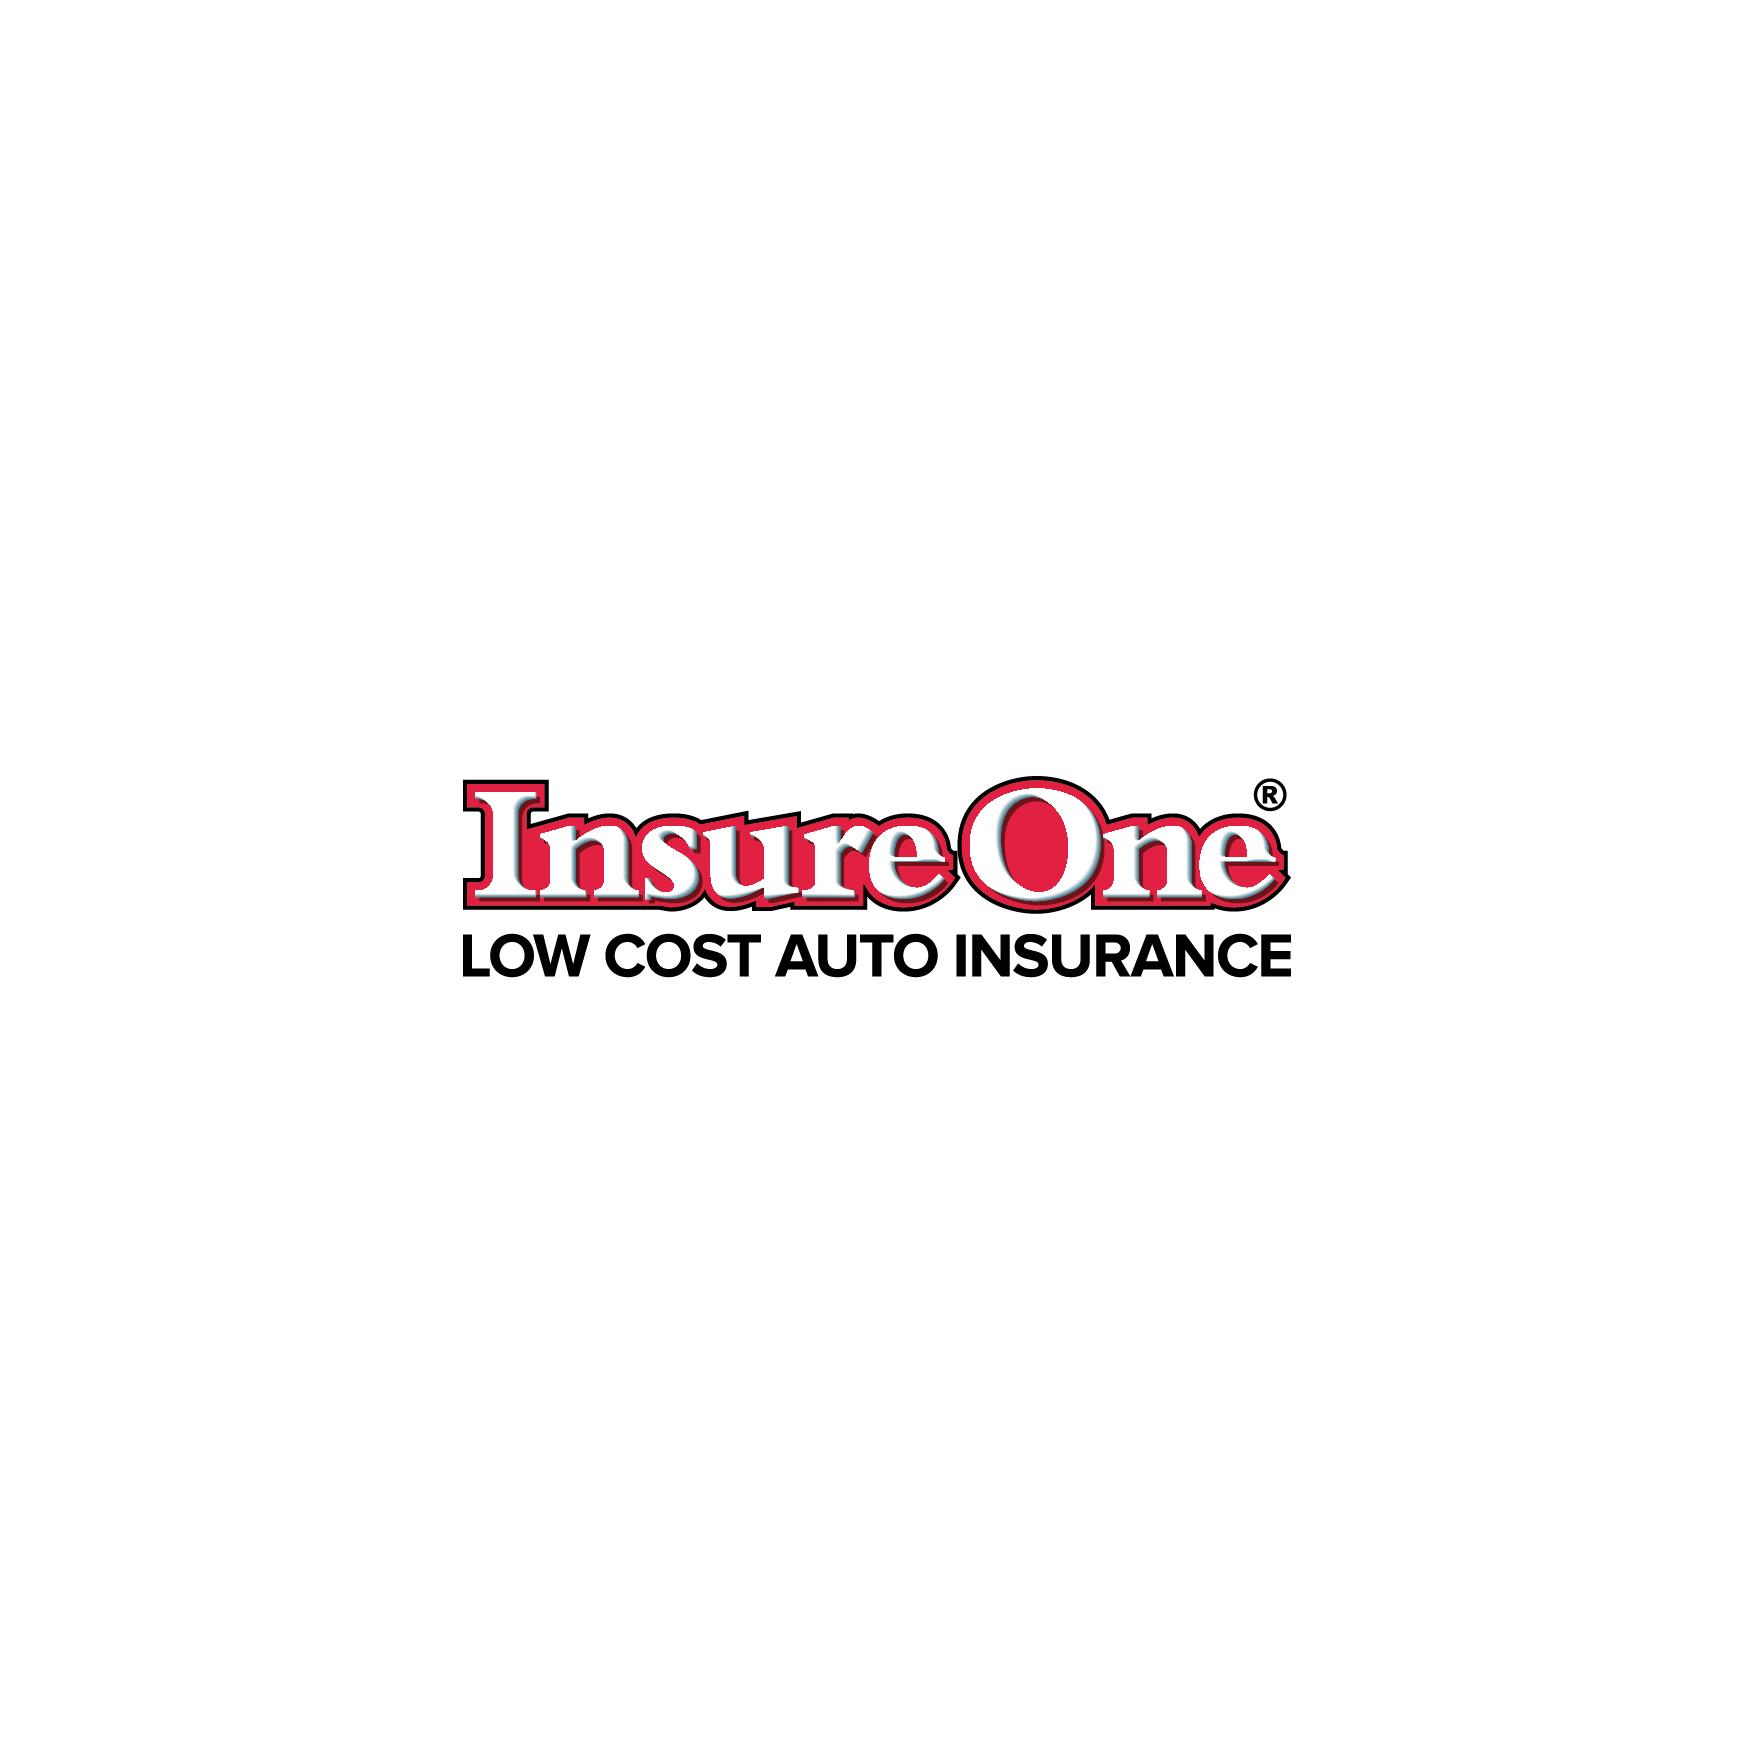 InsureOne Insurance Agency